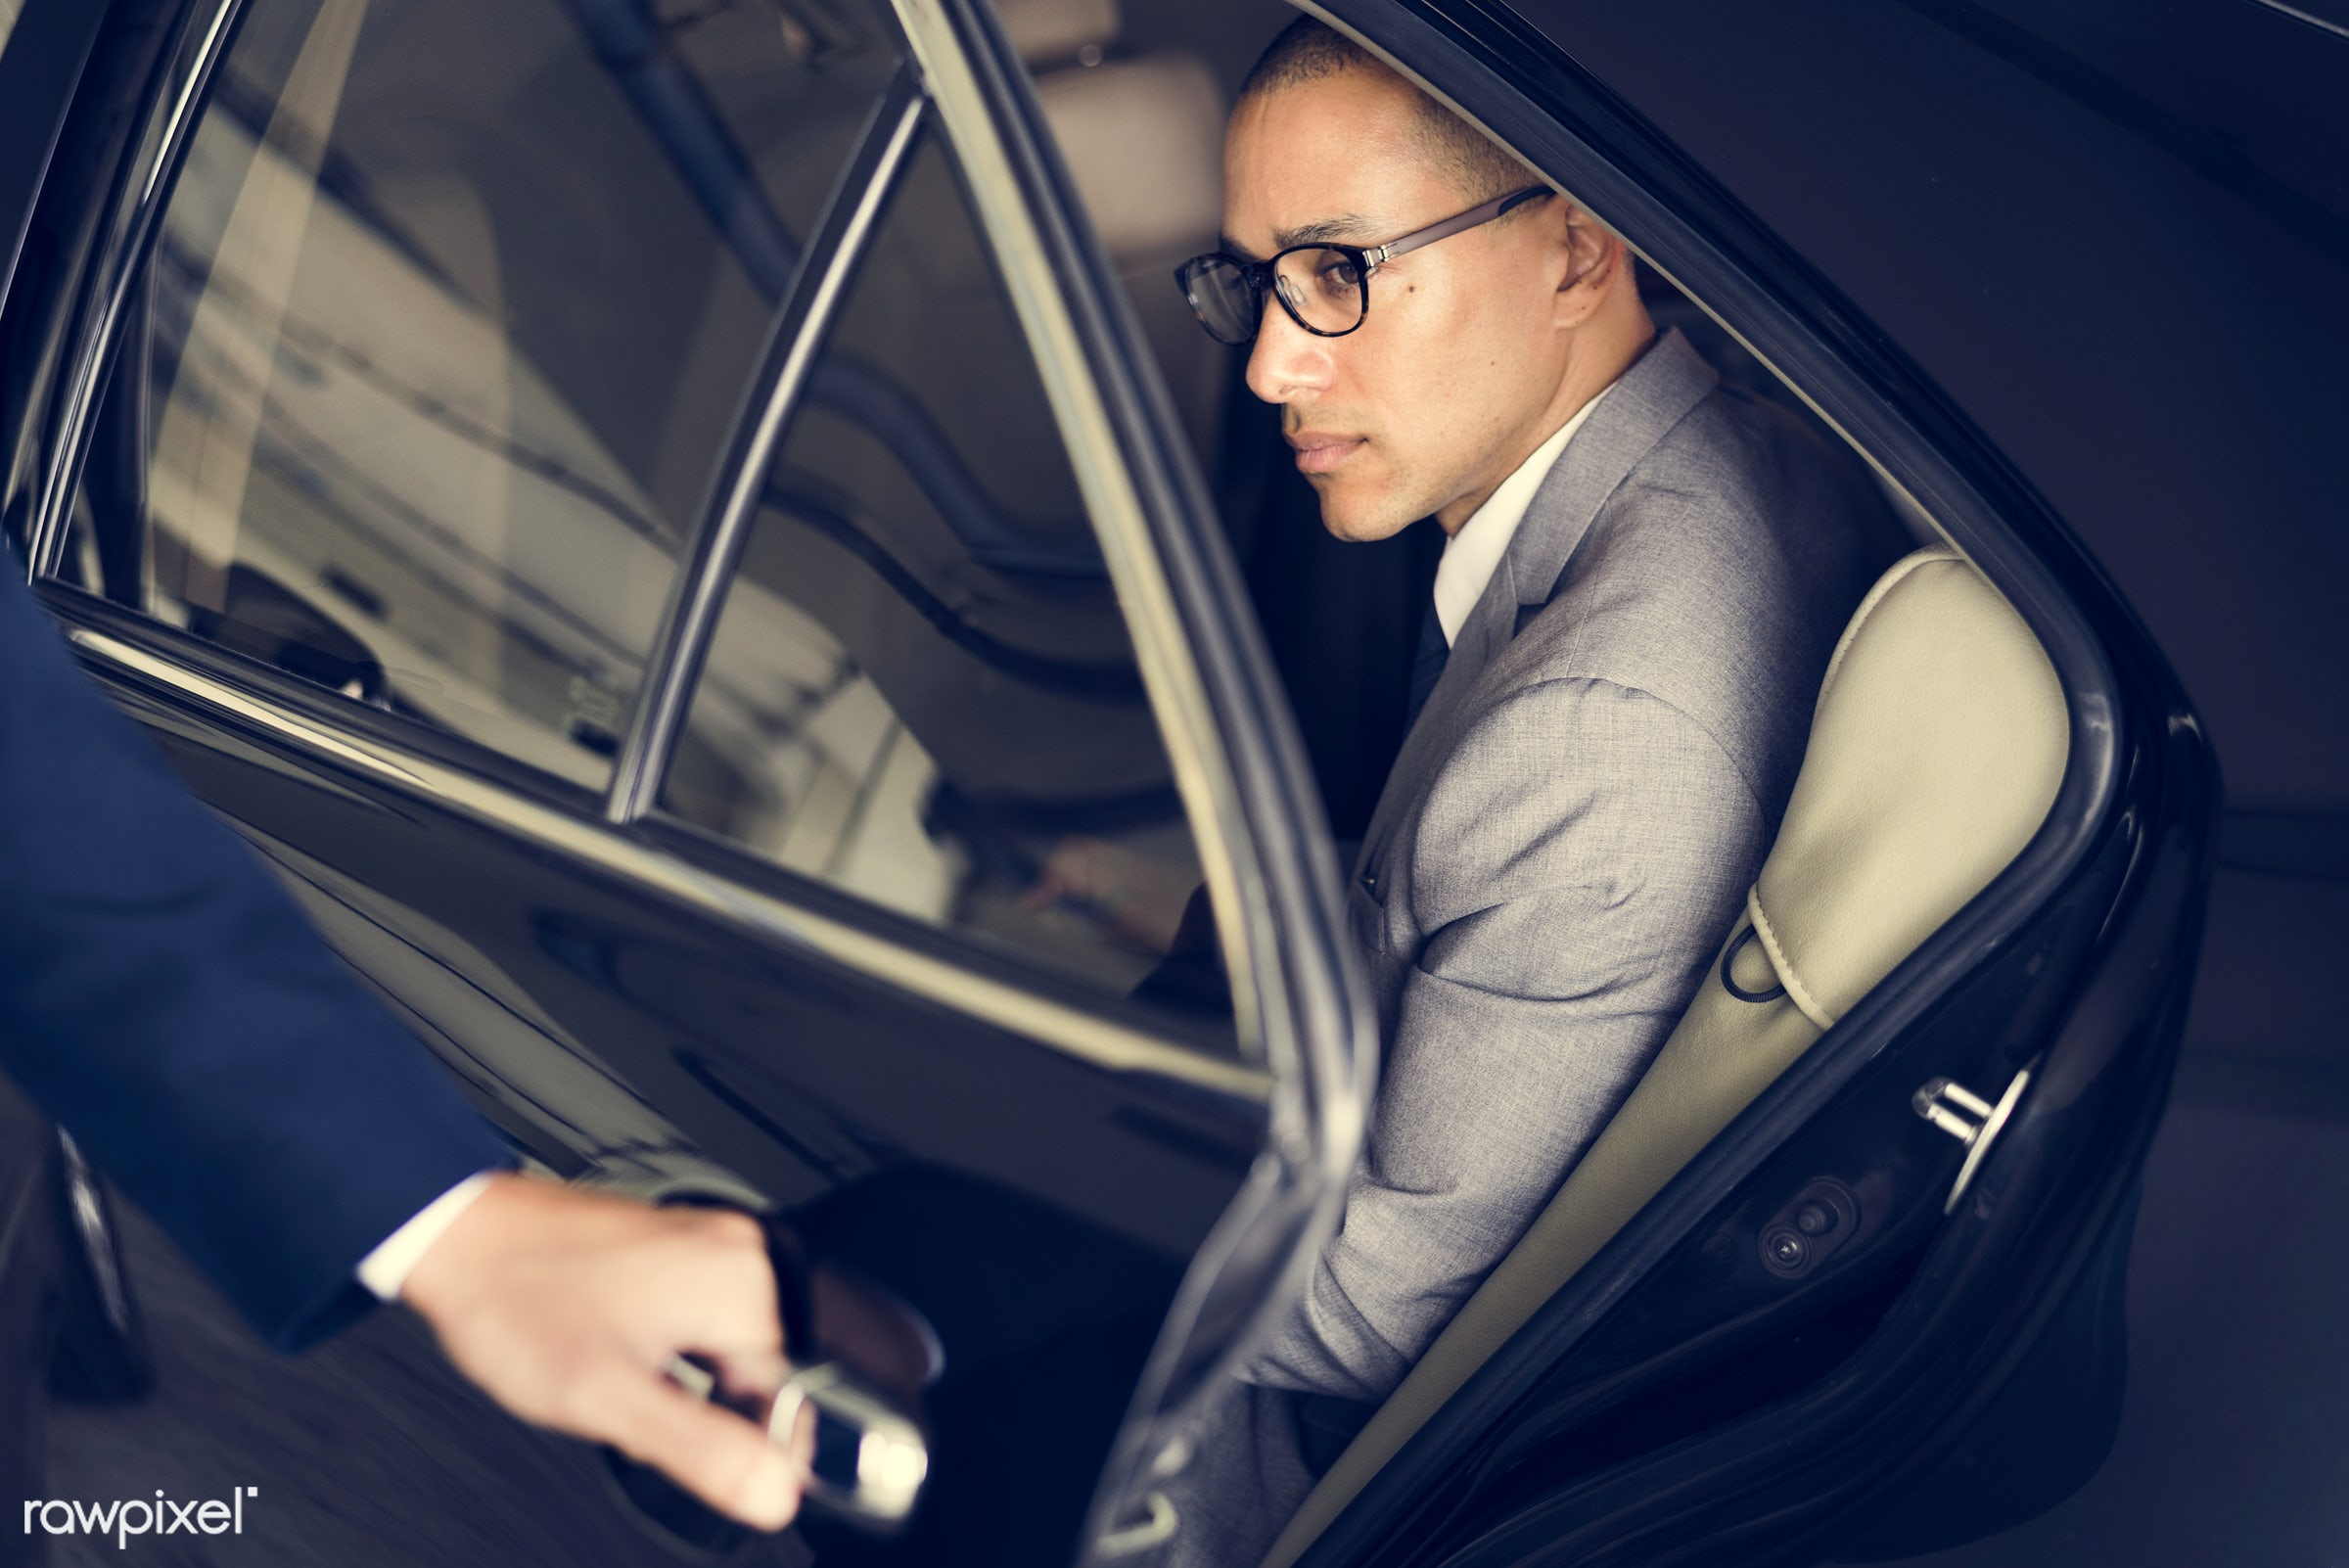 adult, business, businessman, businessmen, candid, car, car door, corporate, door, employee, ethnicity, fashion, formal,...